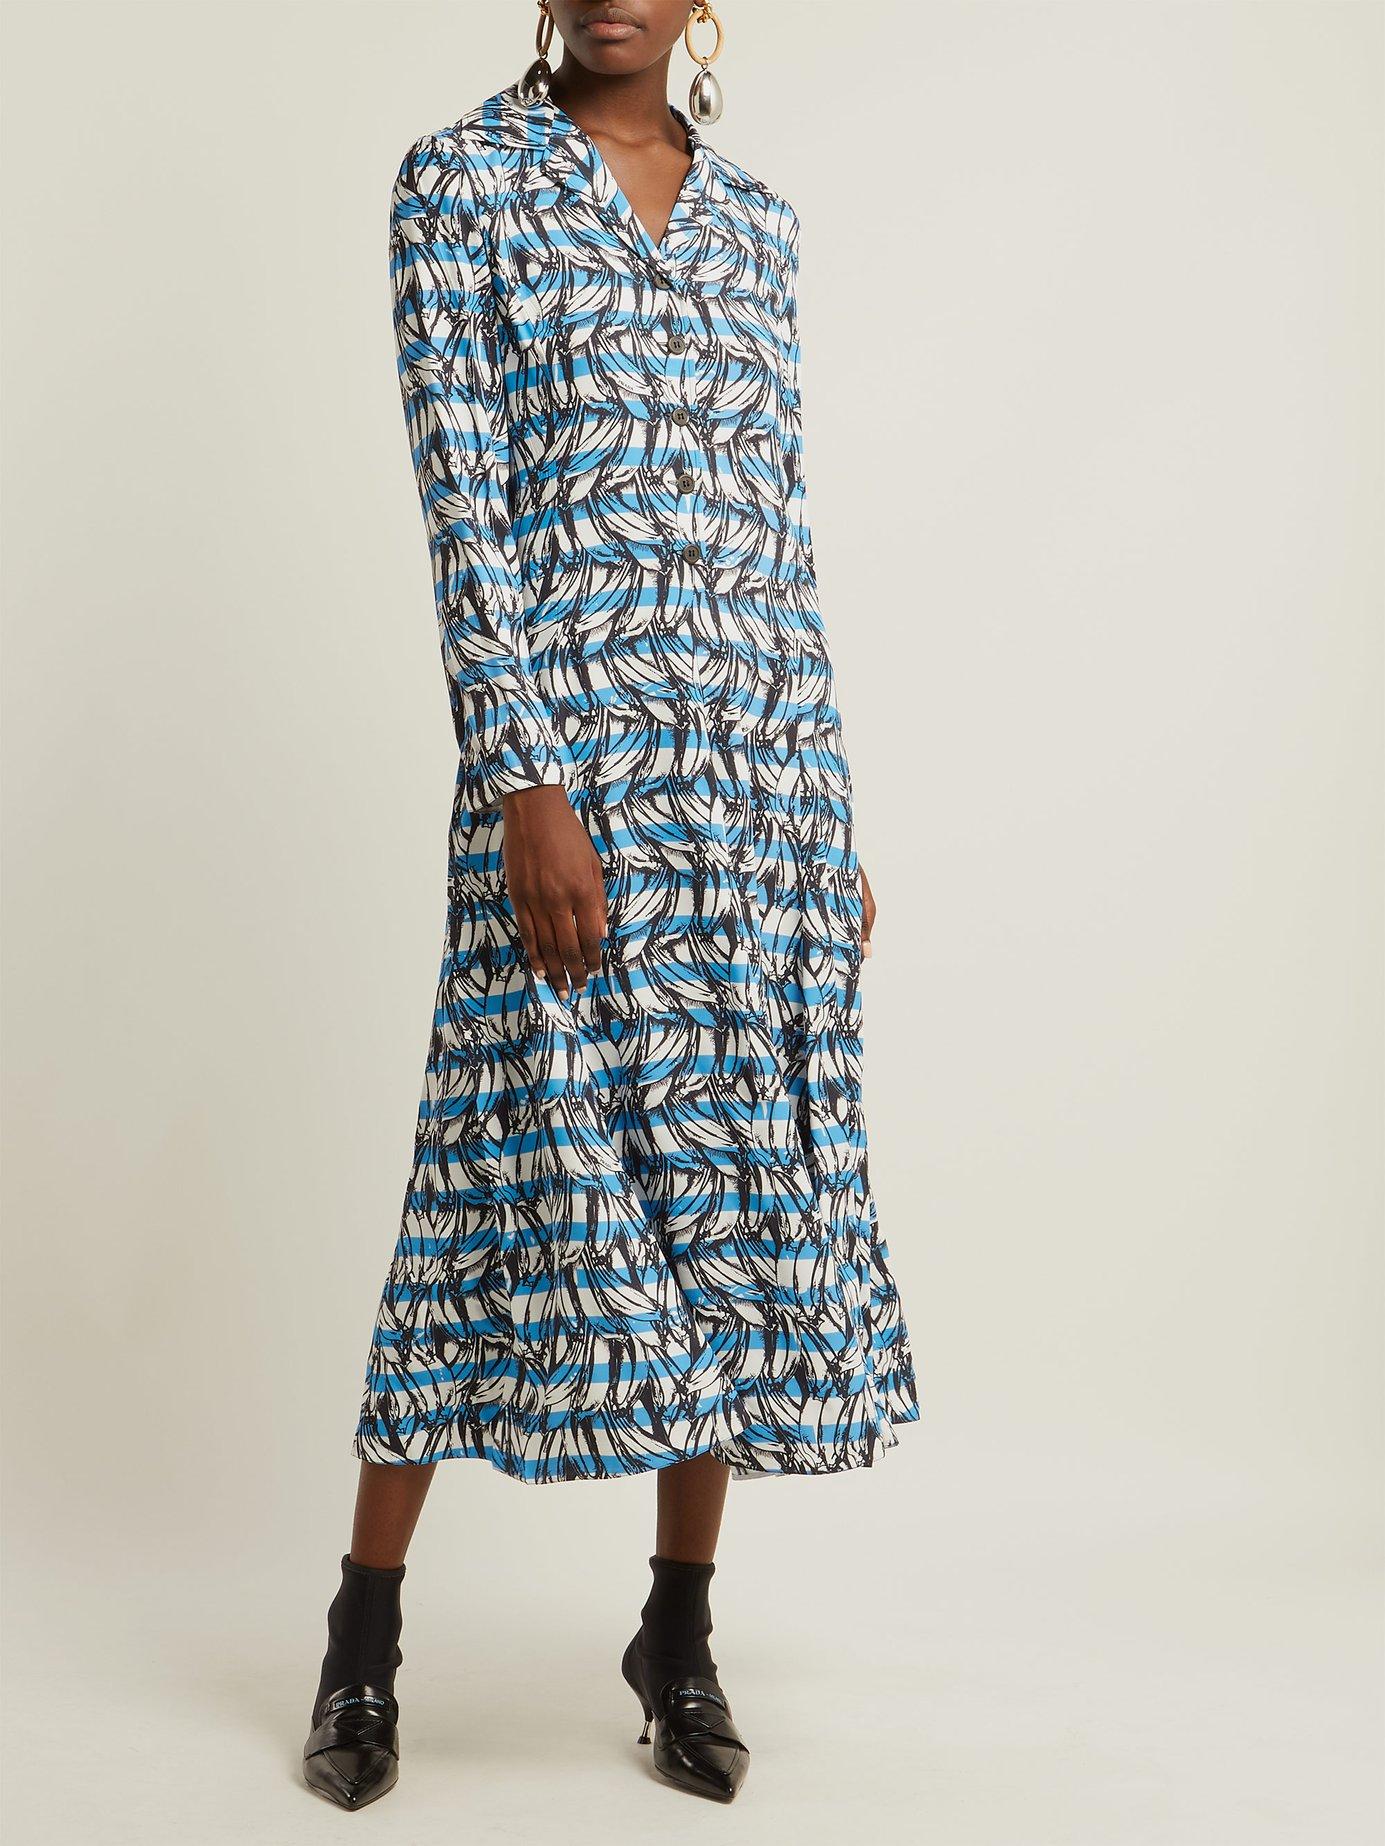 Banana-print striped shirt dress by Prada